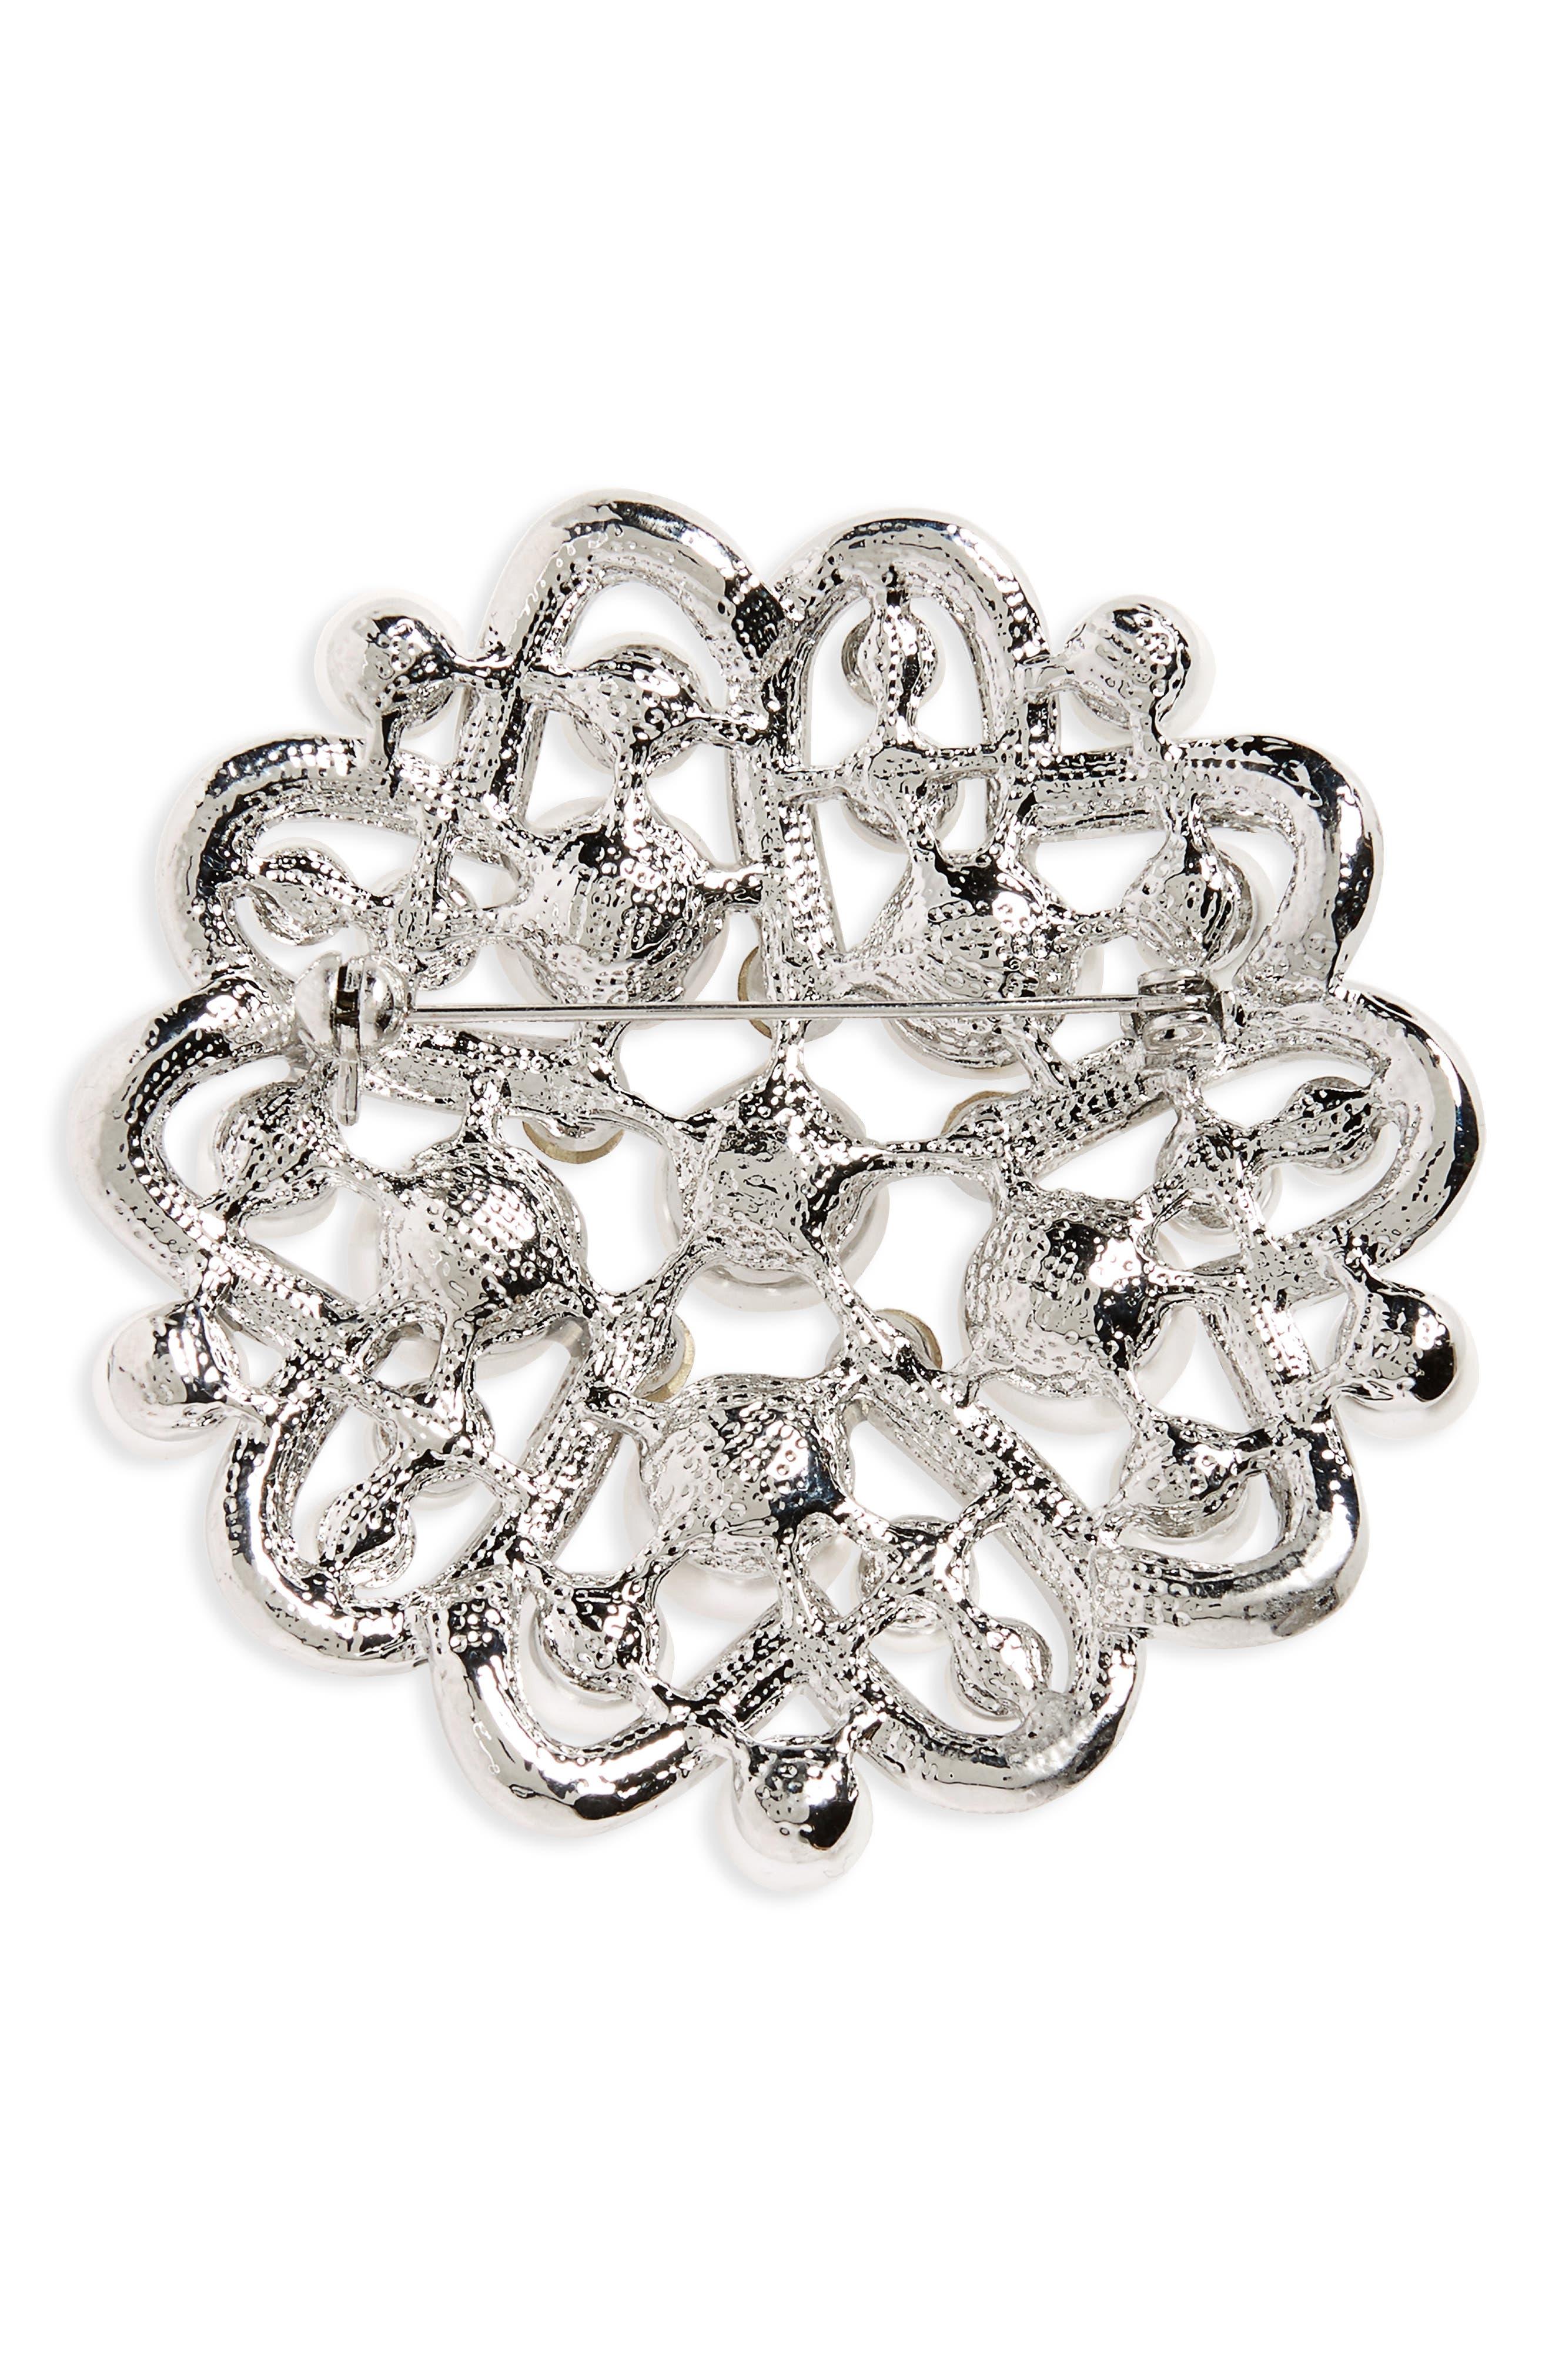 Imitation Pearl & Crystal Brooch,                             Alternate thumbnail 2, color,                             Ivory Pearl / Silver